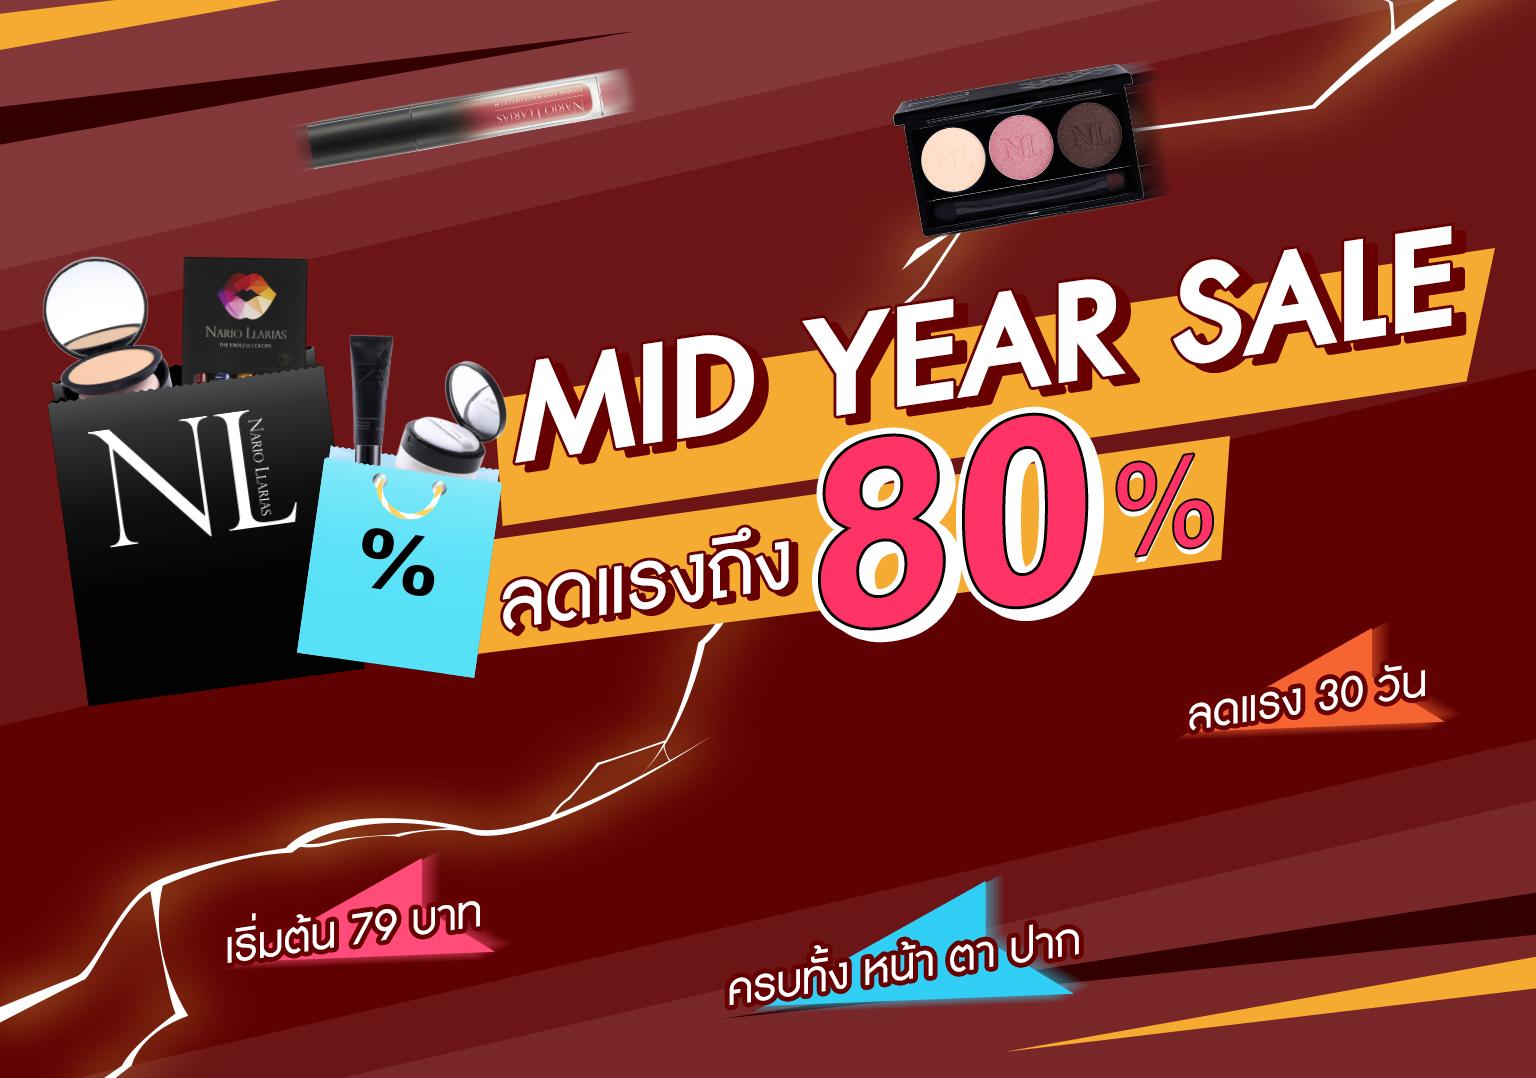 NL Mid Year Sale